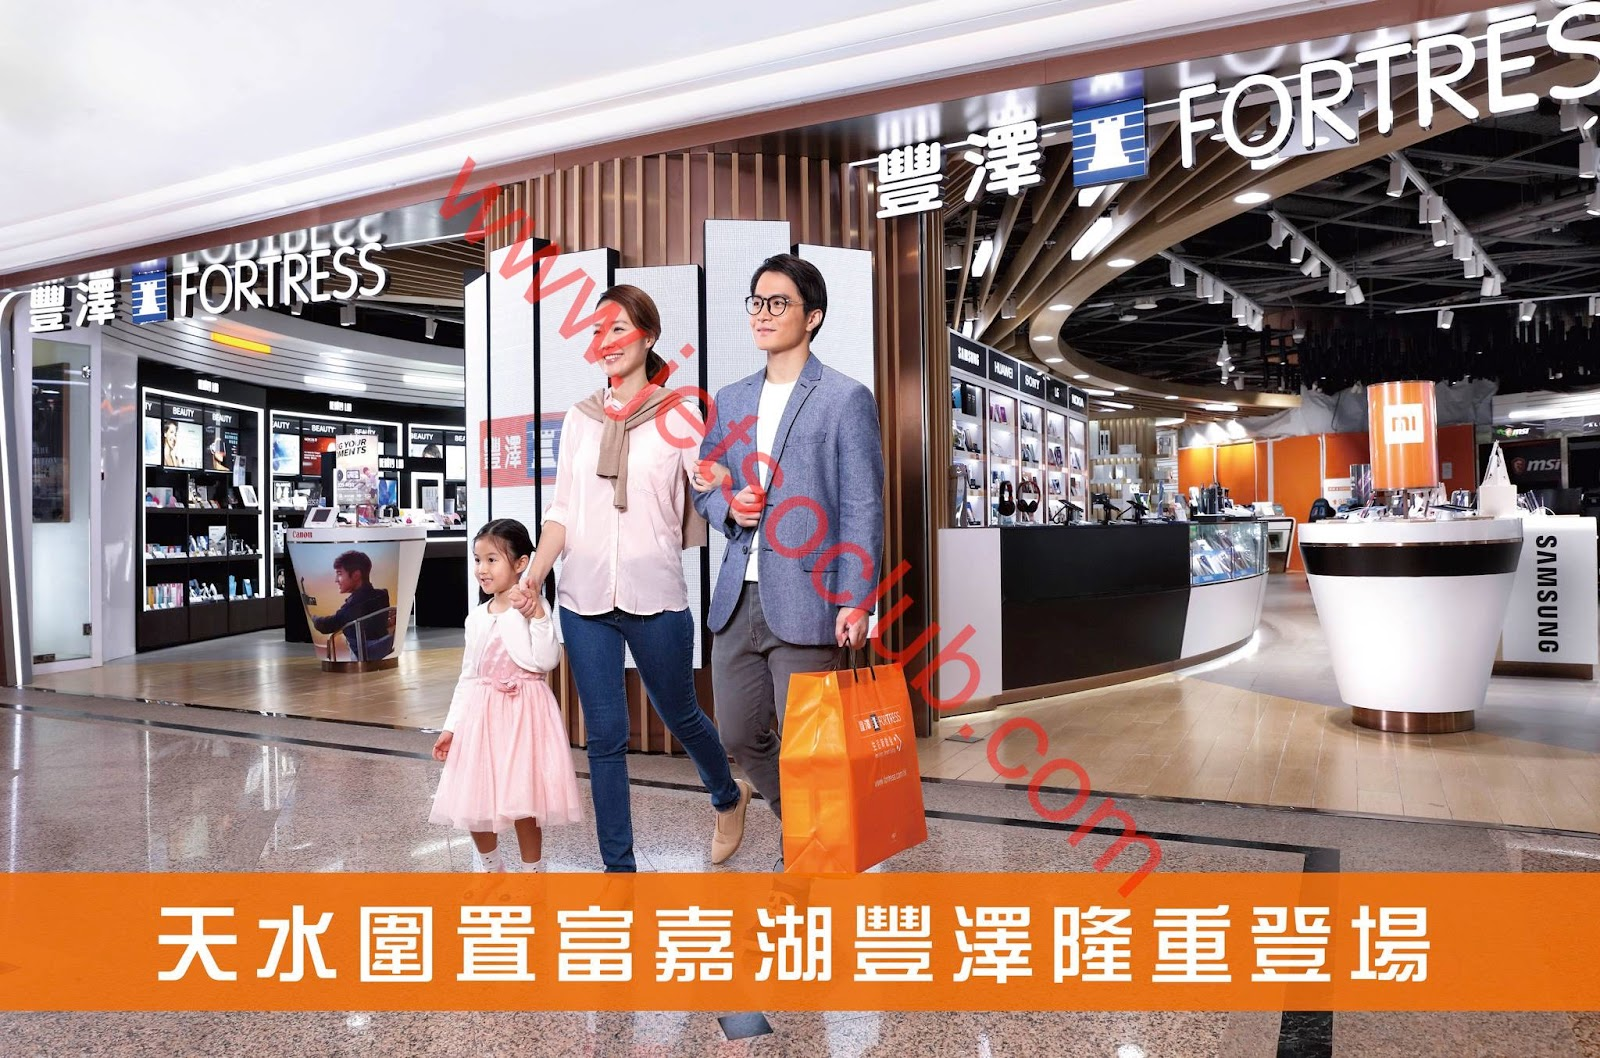 Fortress 豐澤:天水圍店 開幕優惠(至14/2) ( Jetso Club 著數俱樂部 )